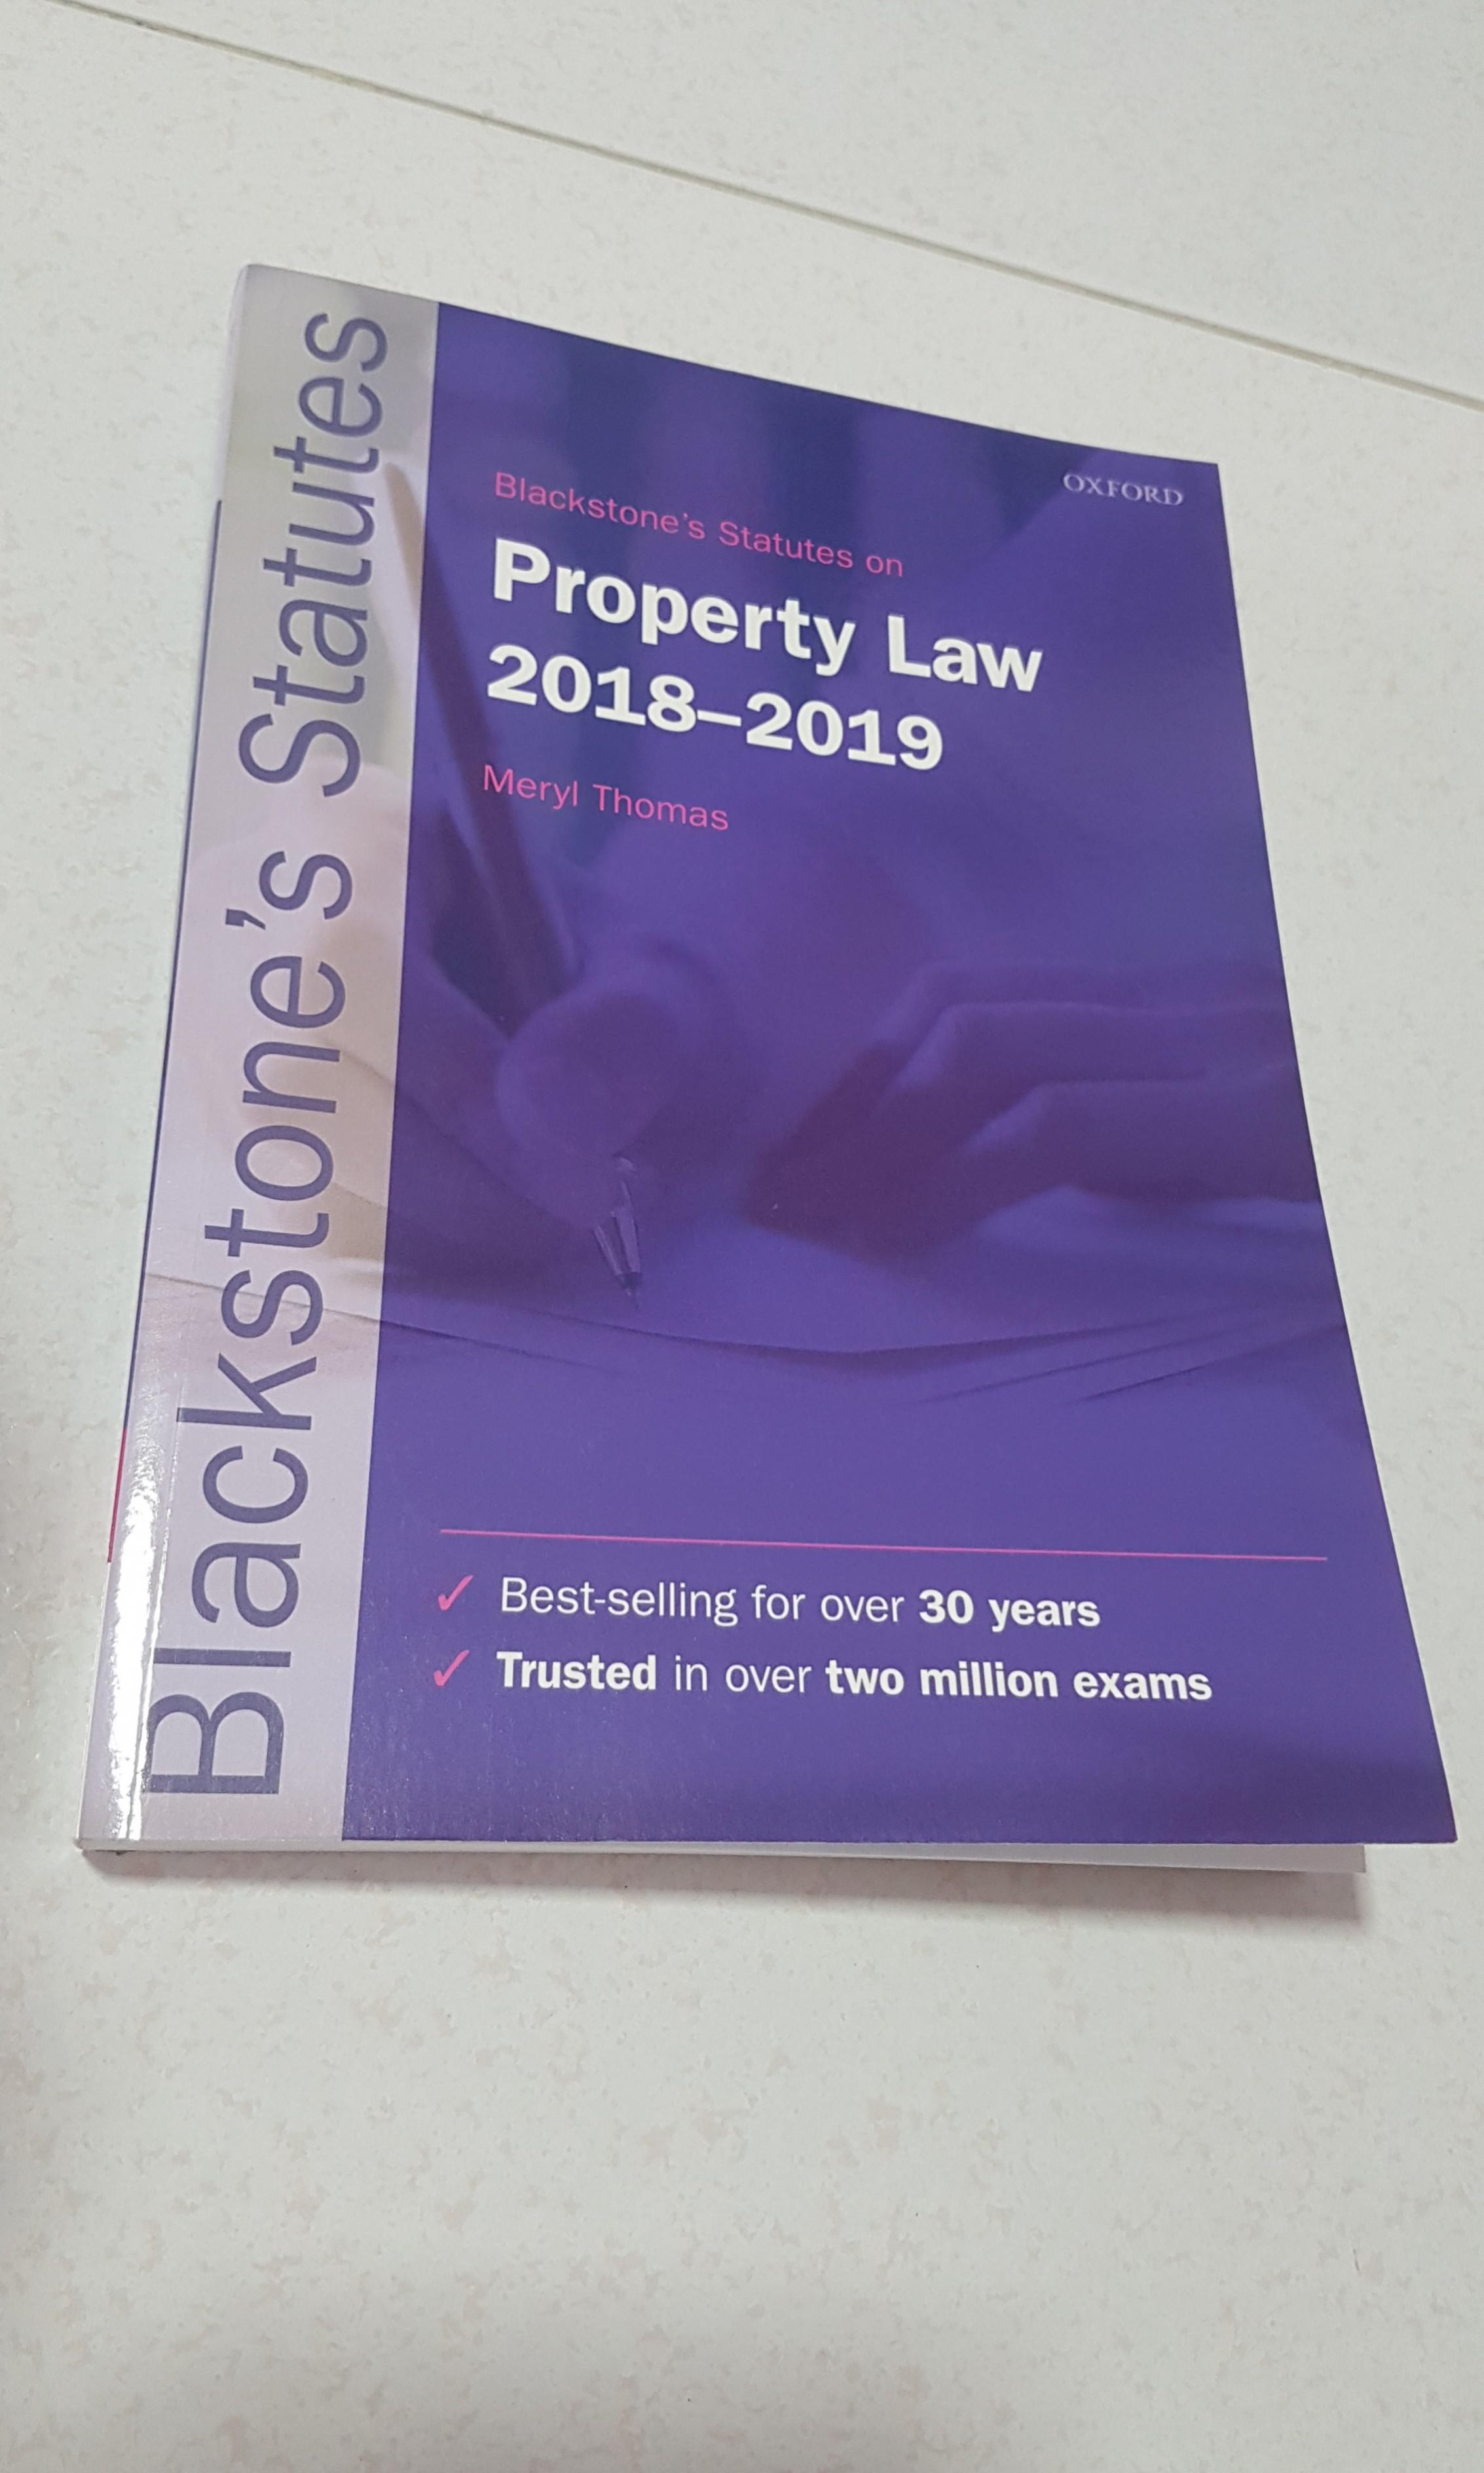 Blackstone's Statutes Property Law 2018-2019